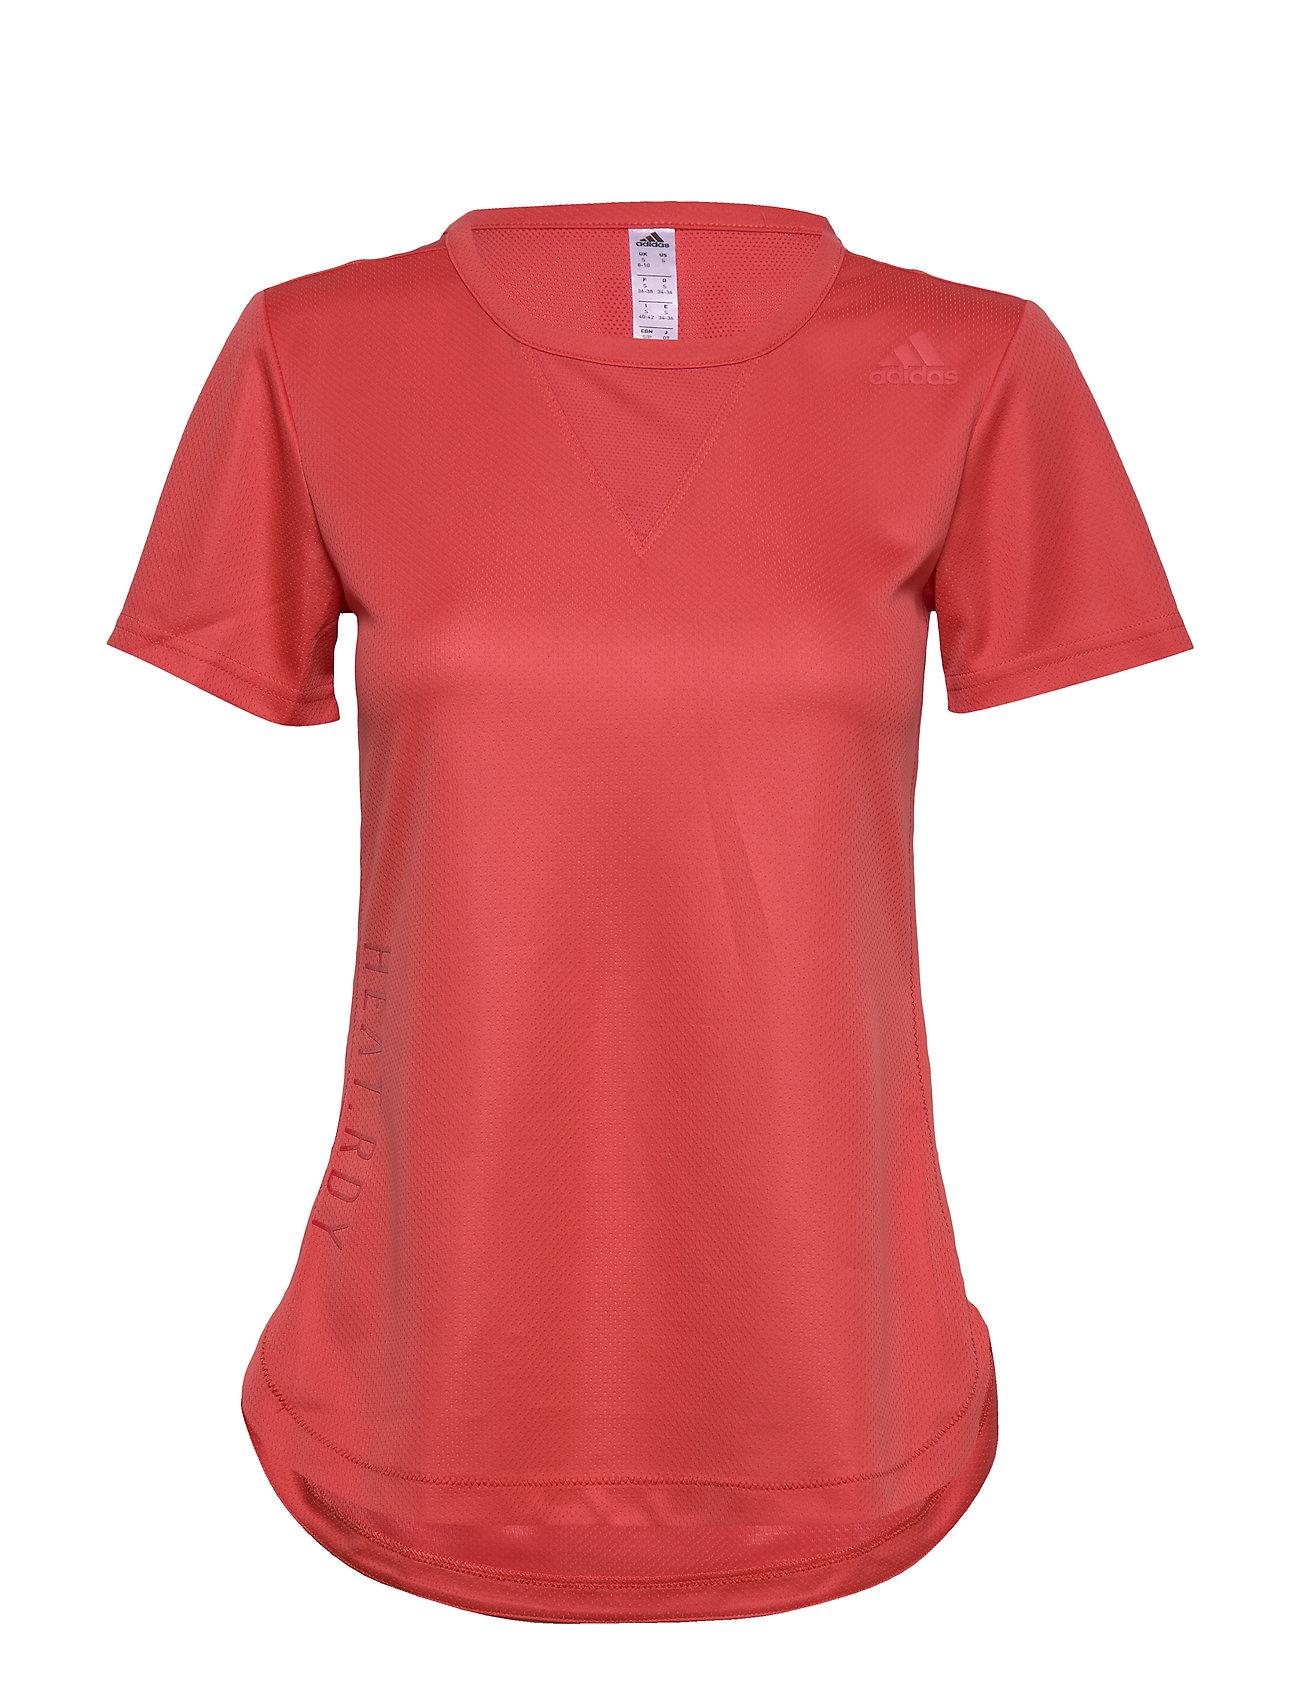 Image of Trg Tee H.Rdy T-shirt Top Rød Adidas Performance (3406255539)